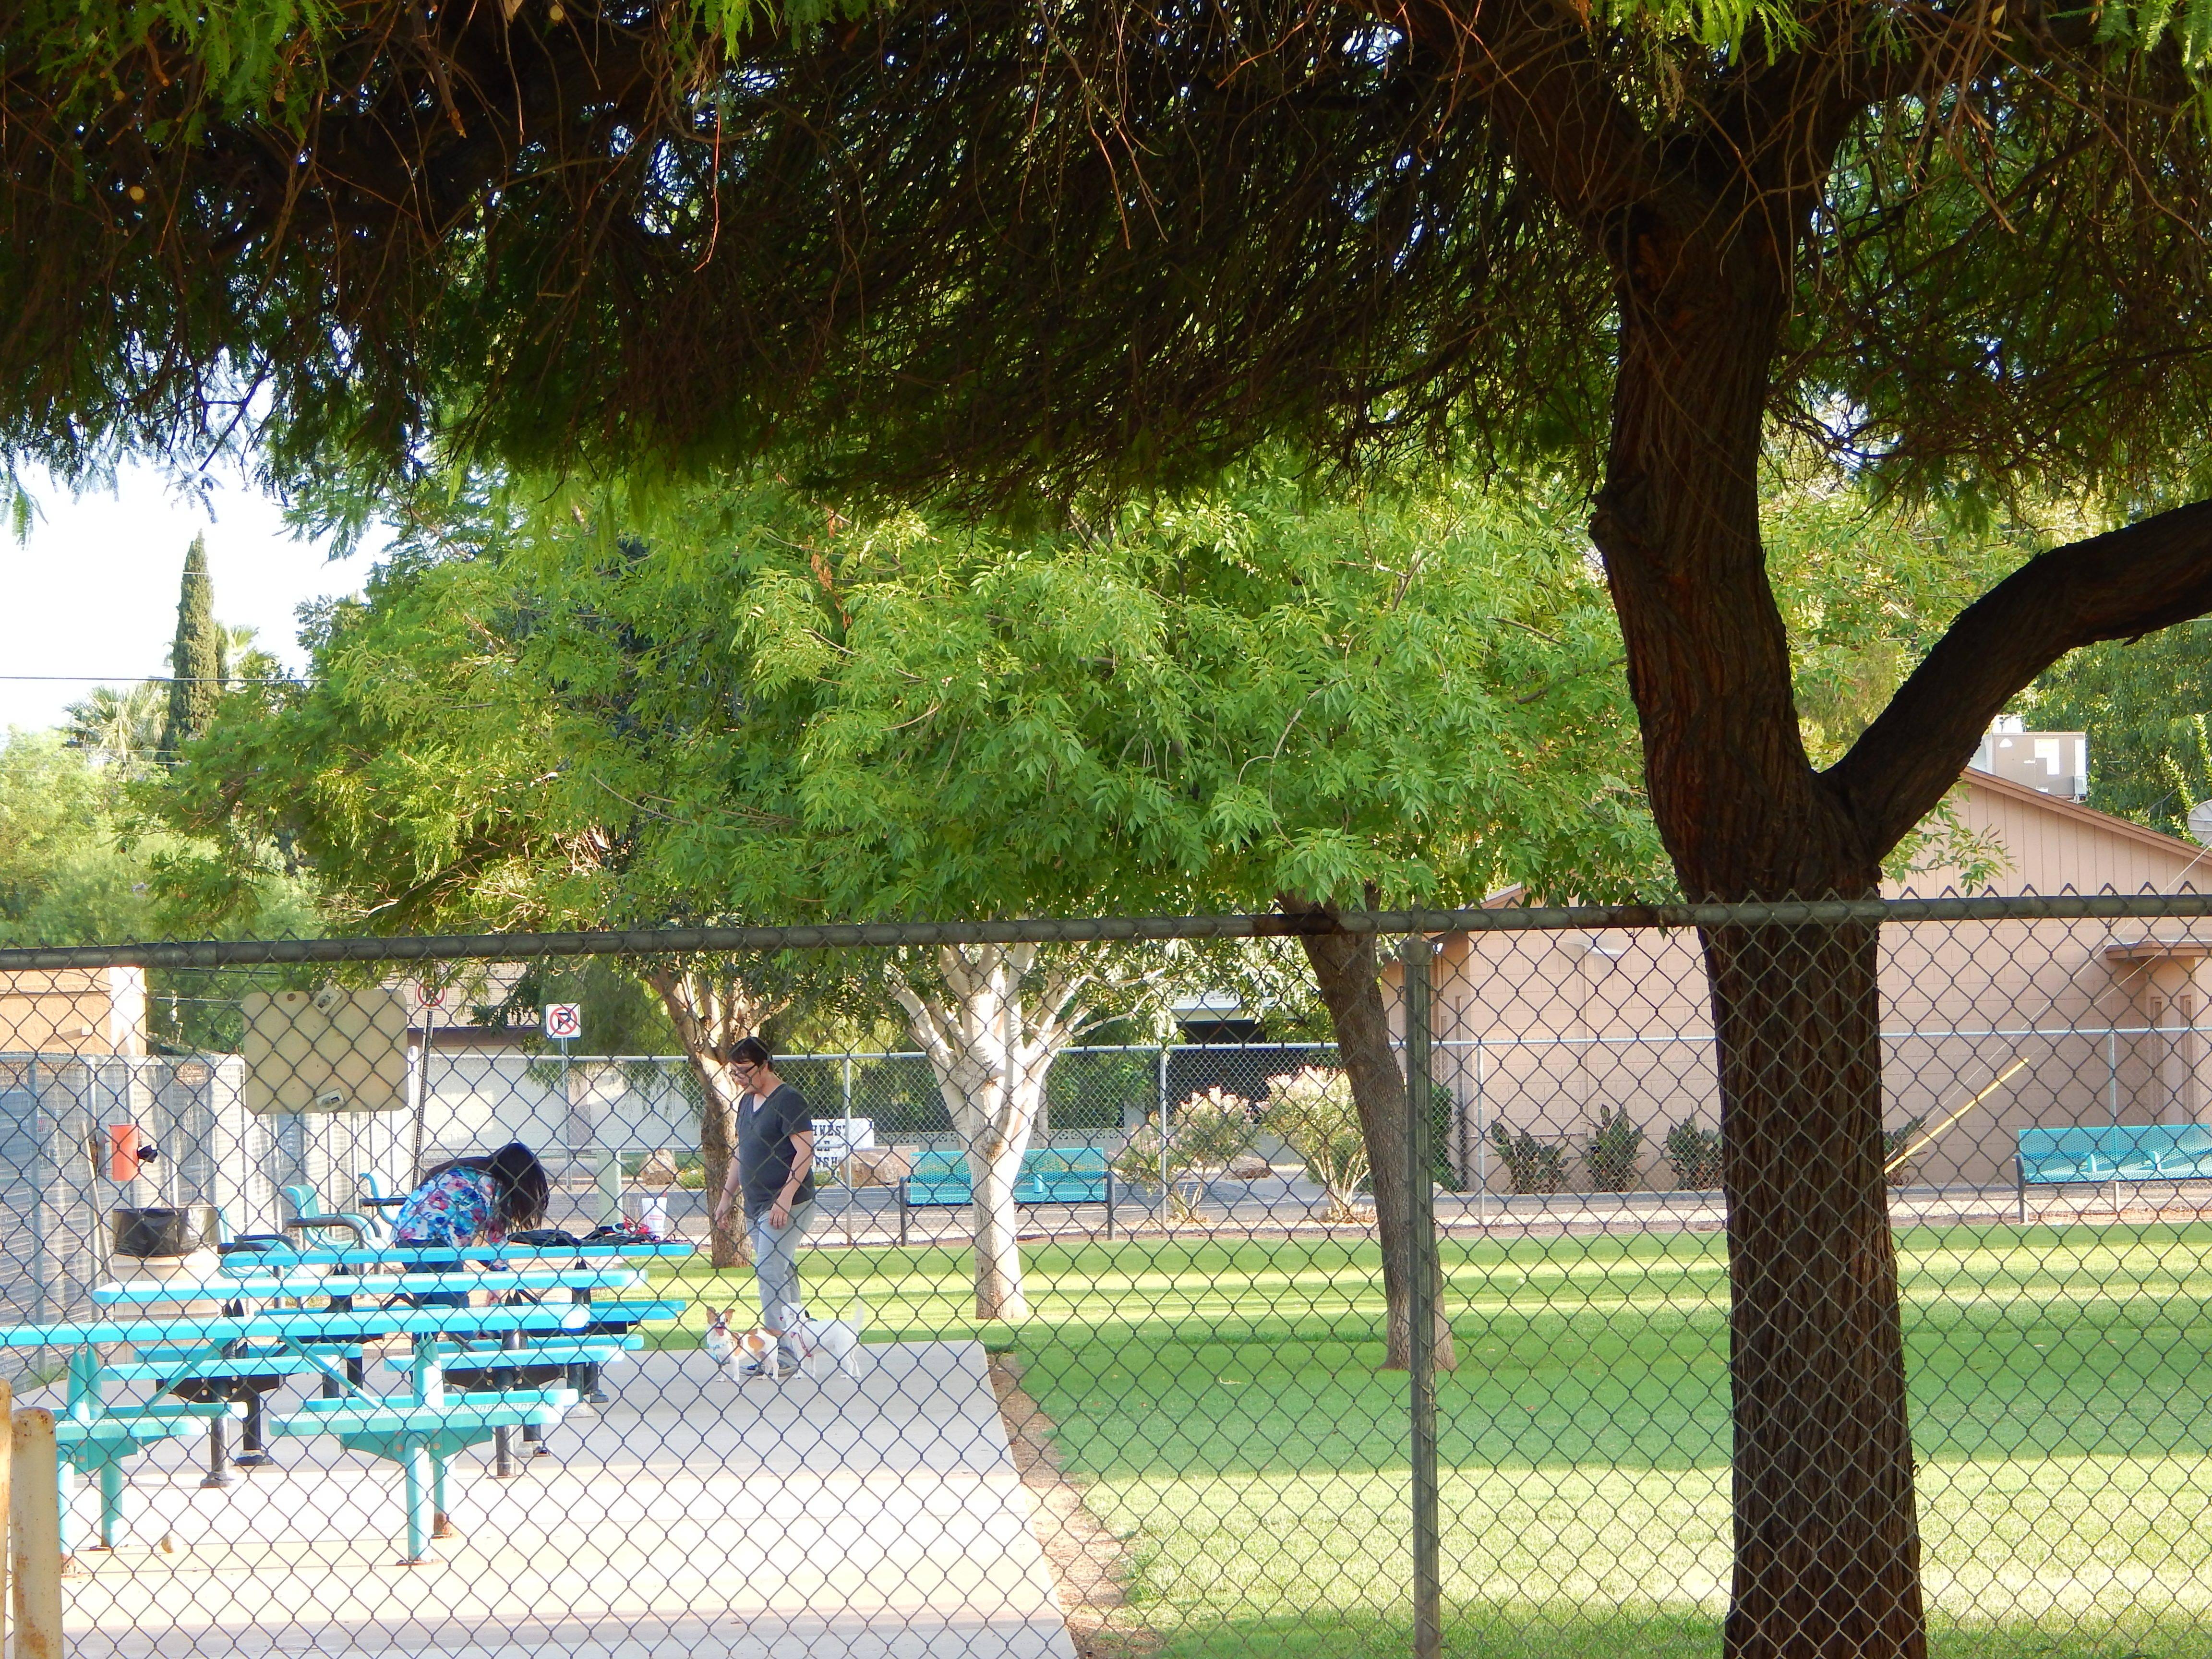 Mitchell Dog Park